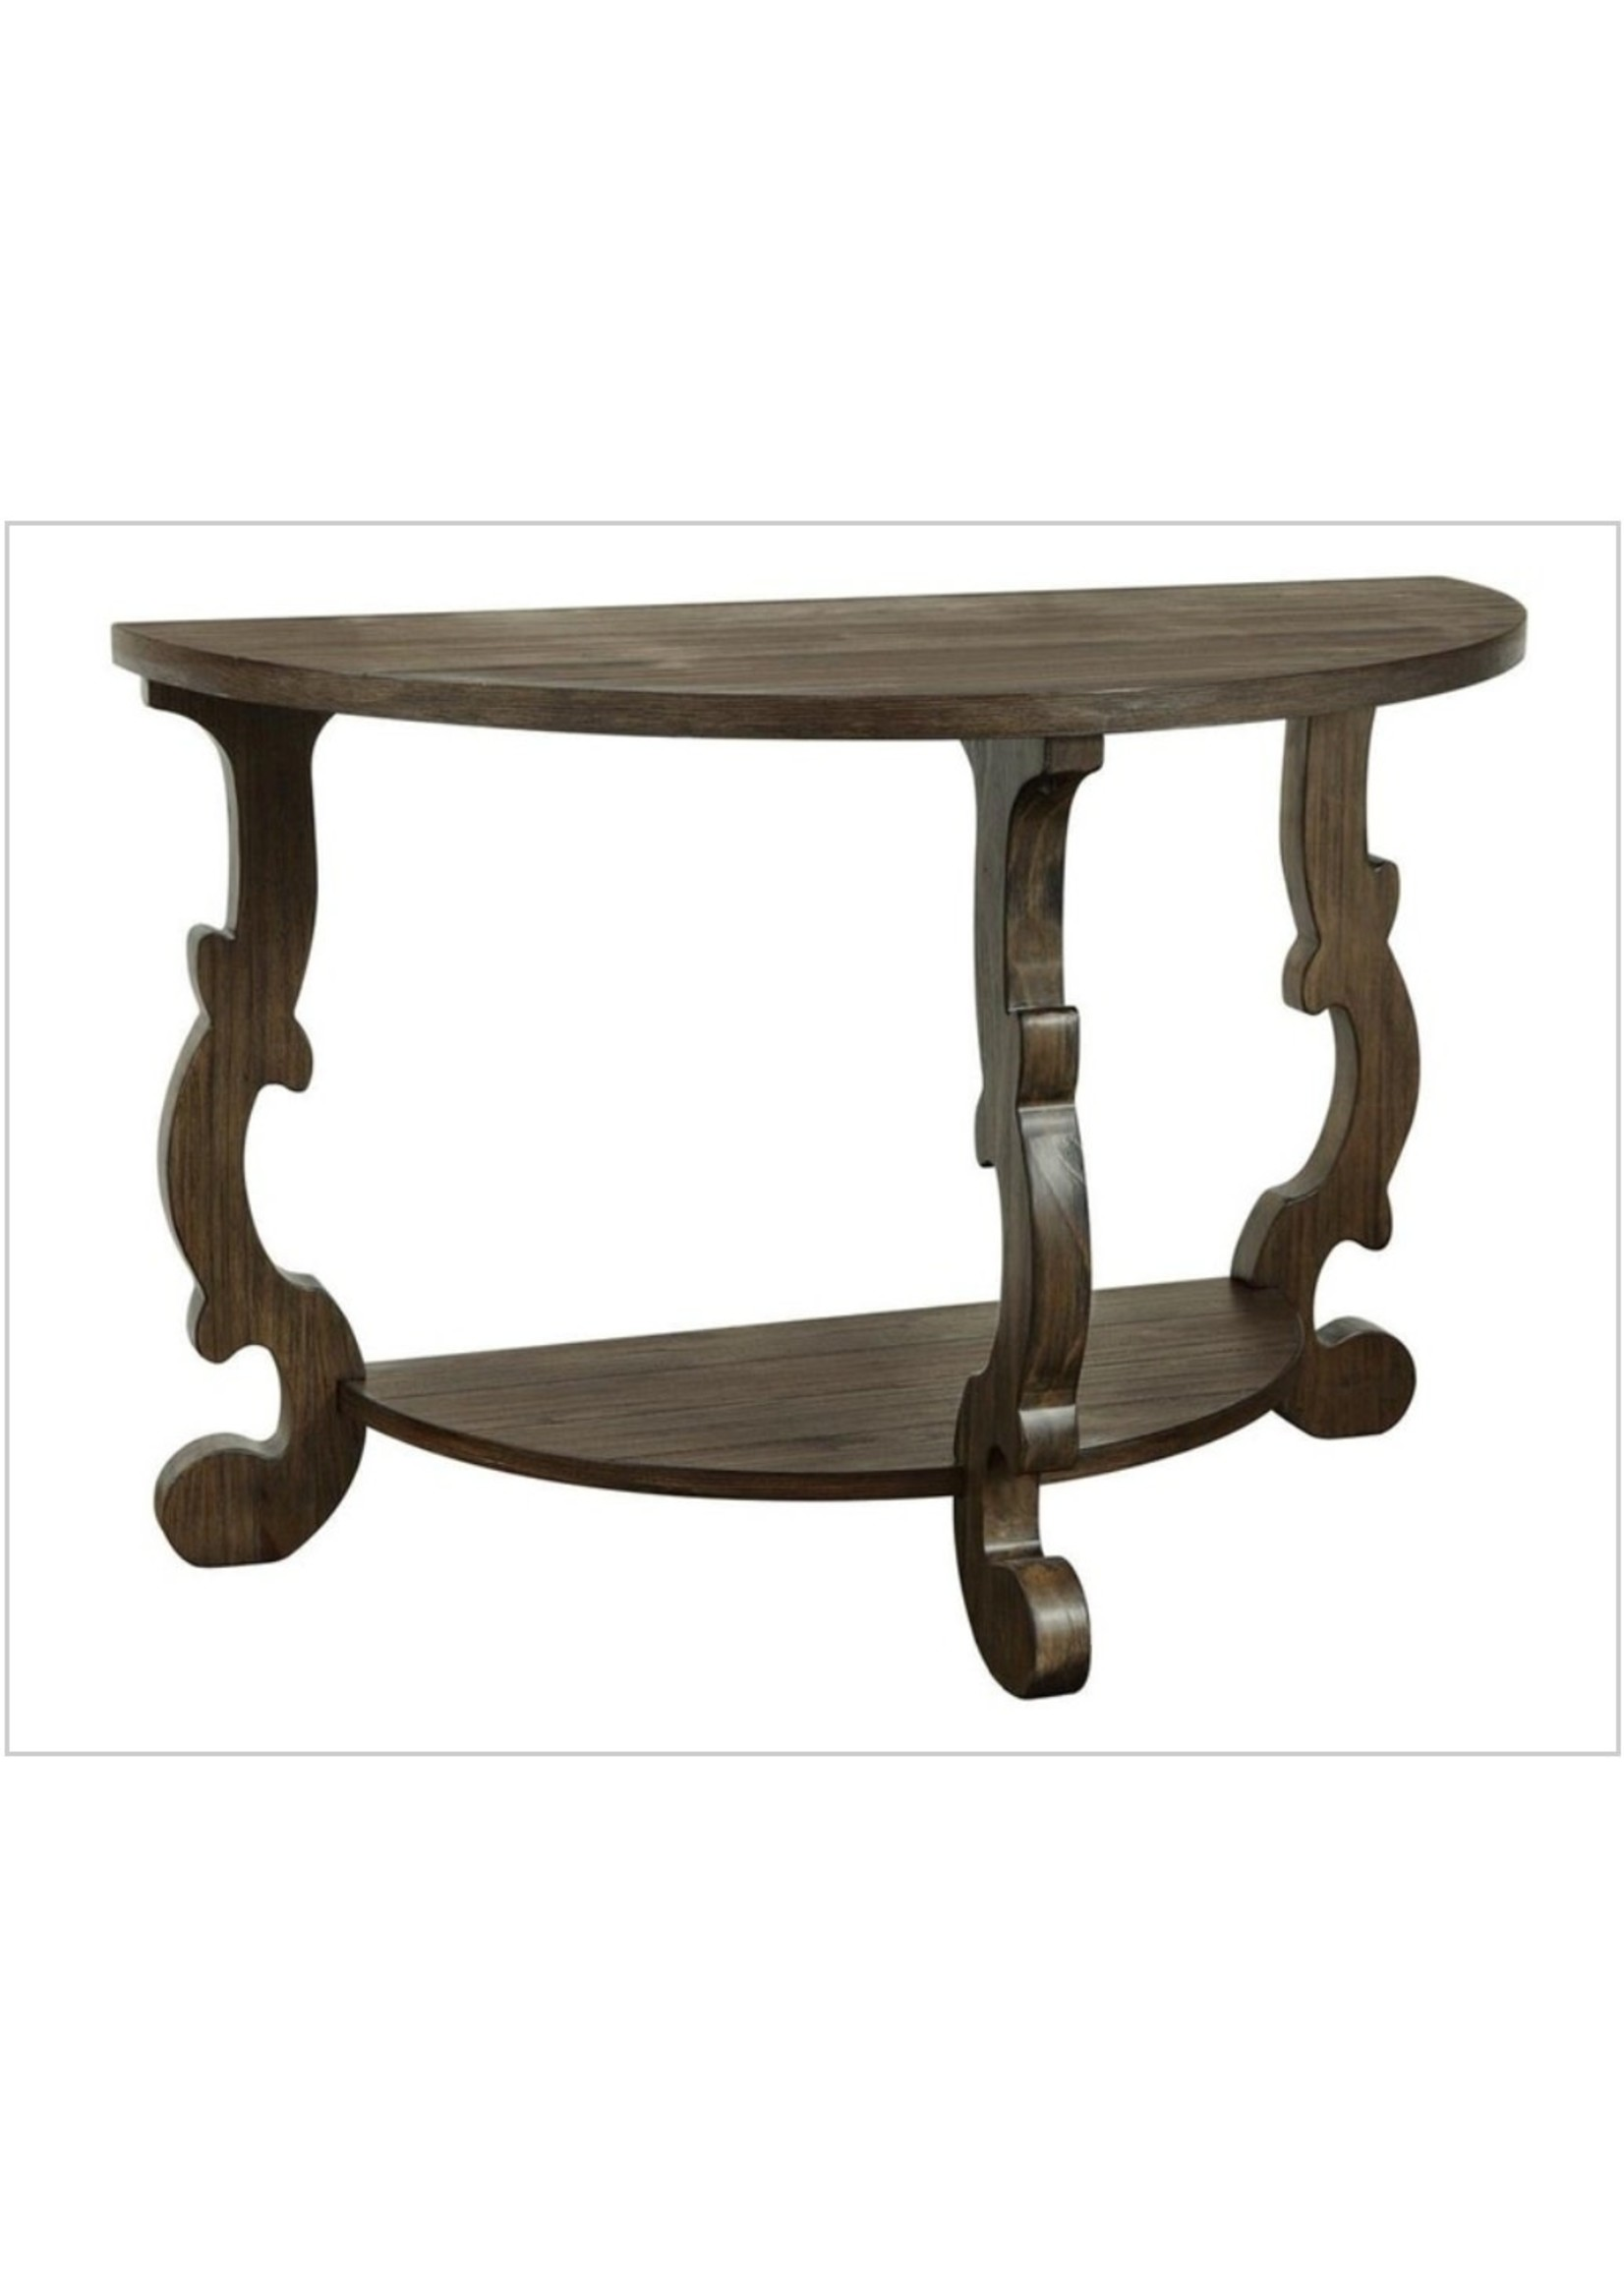 COAST TO COAST 30429 CONSOLE TABLE DEMILUNE BROWN